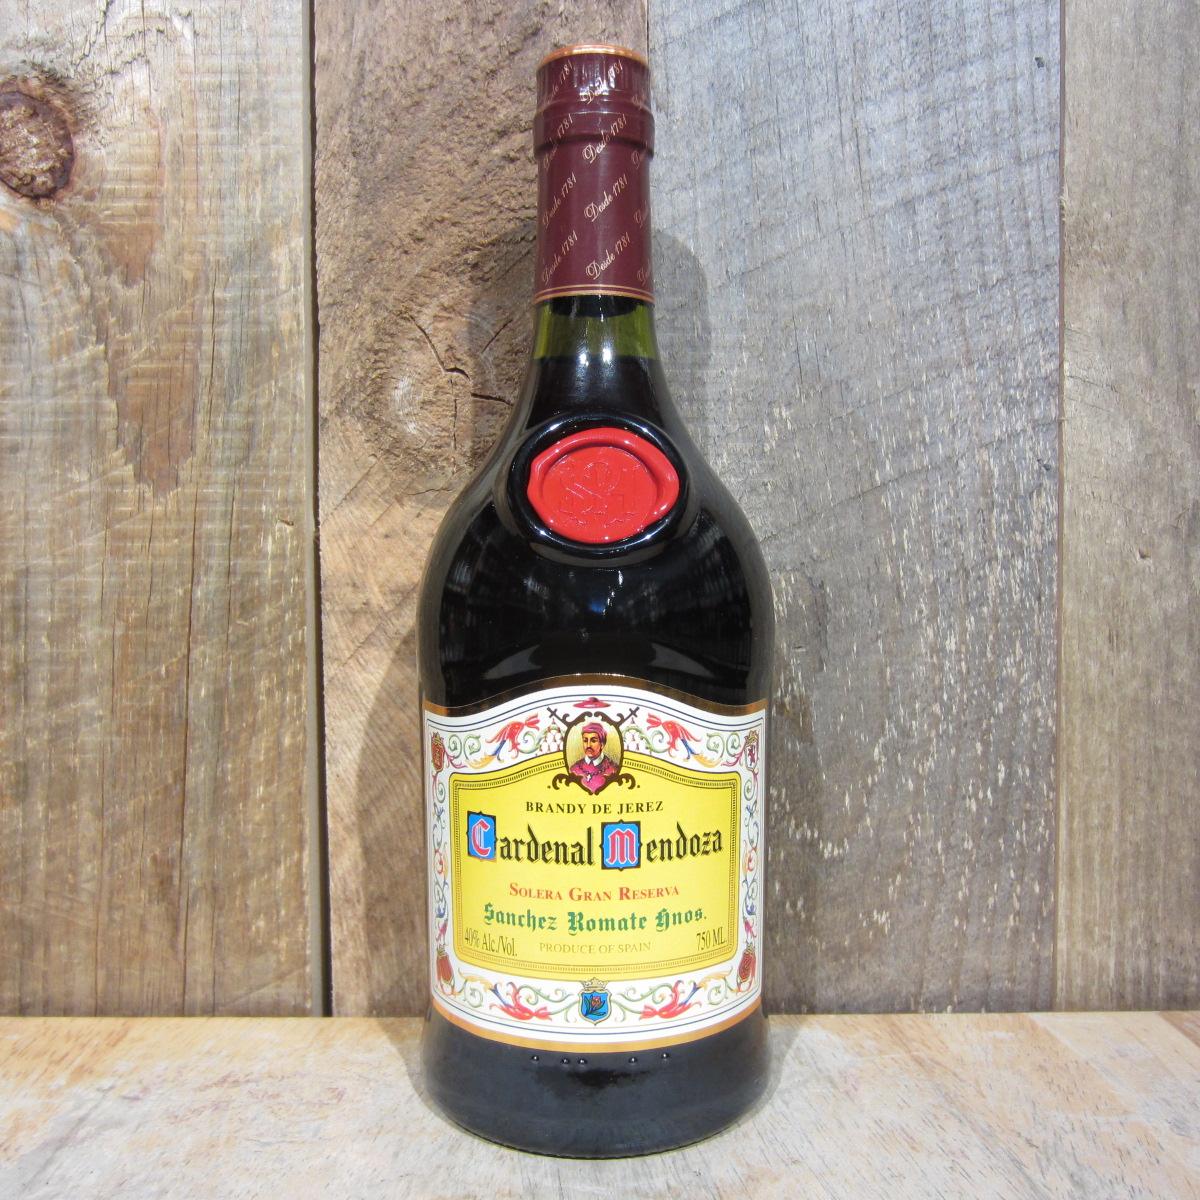 Cardenal Mendoza Brandy de Jerez 750ml